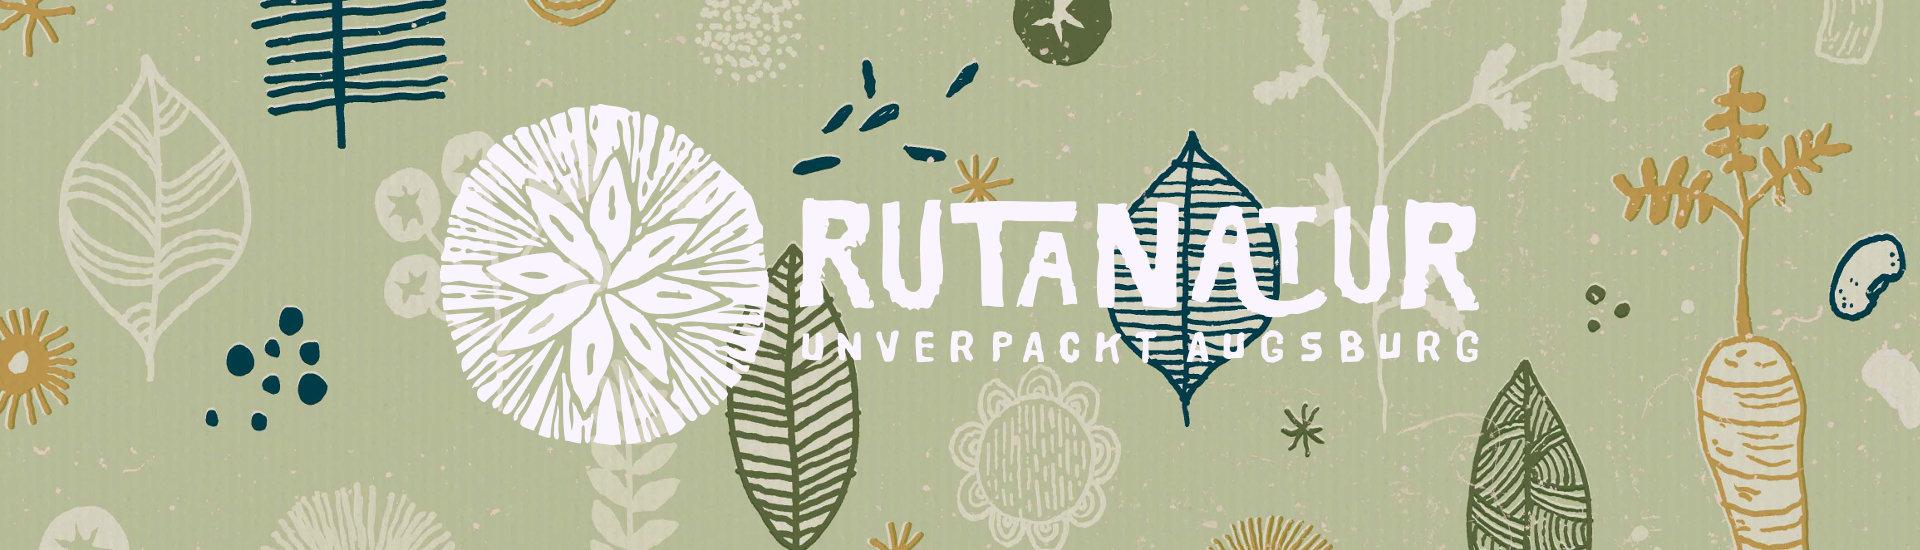 rutaNatur - Pattern 2